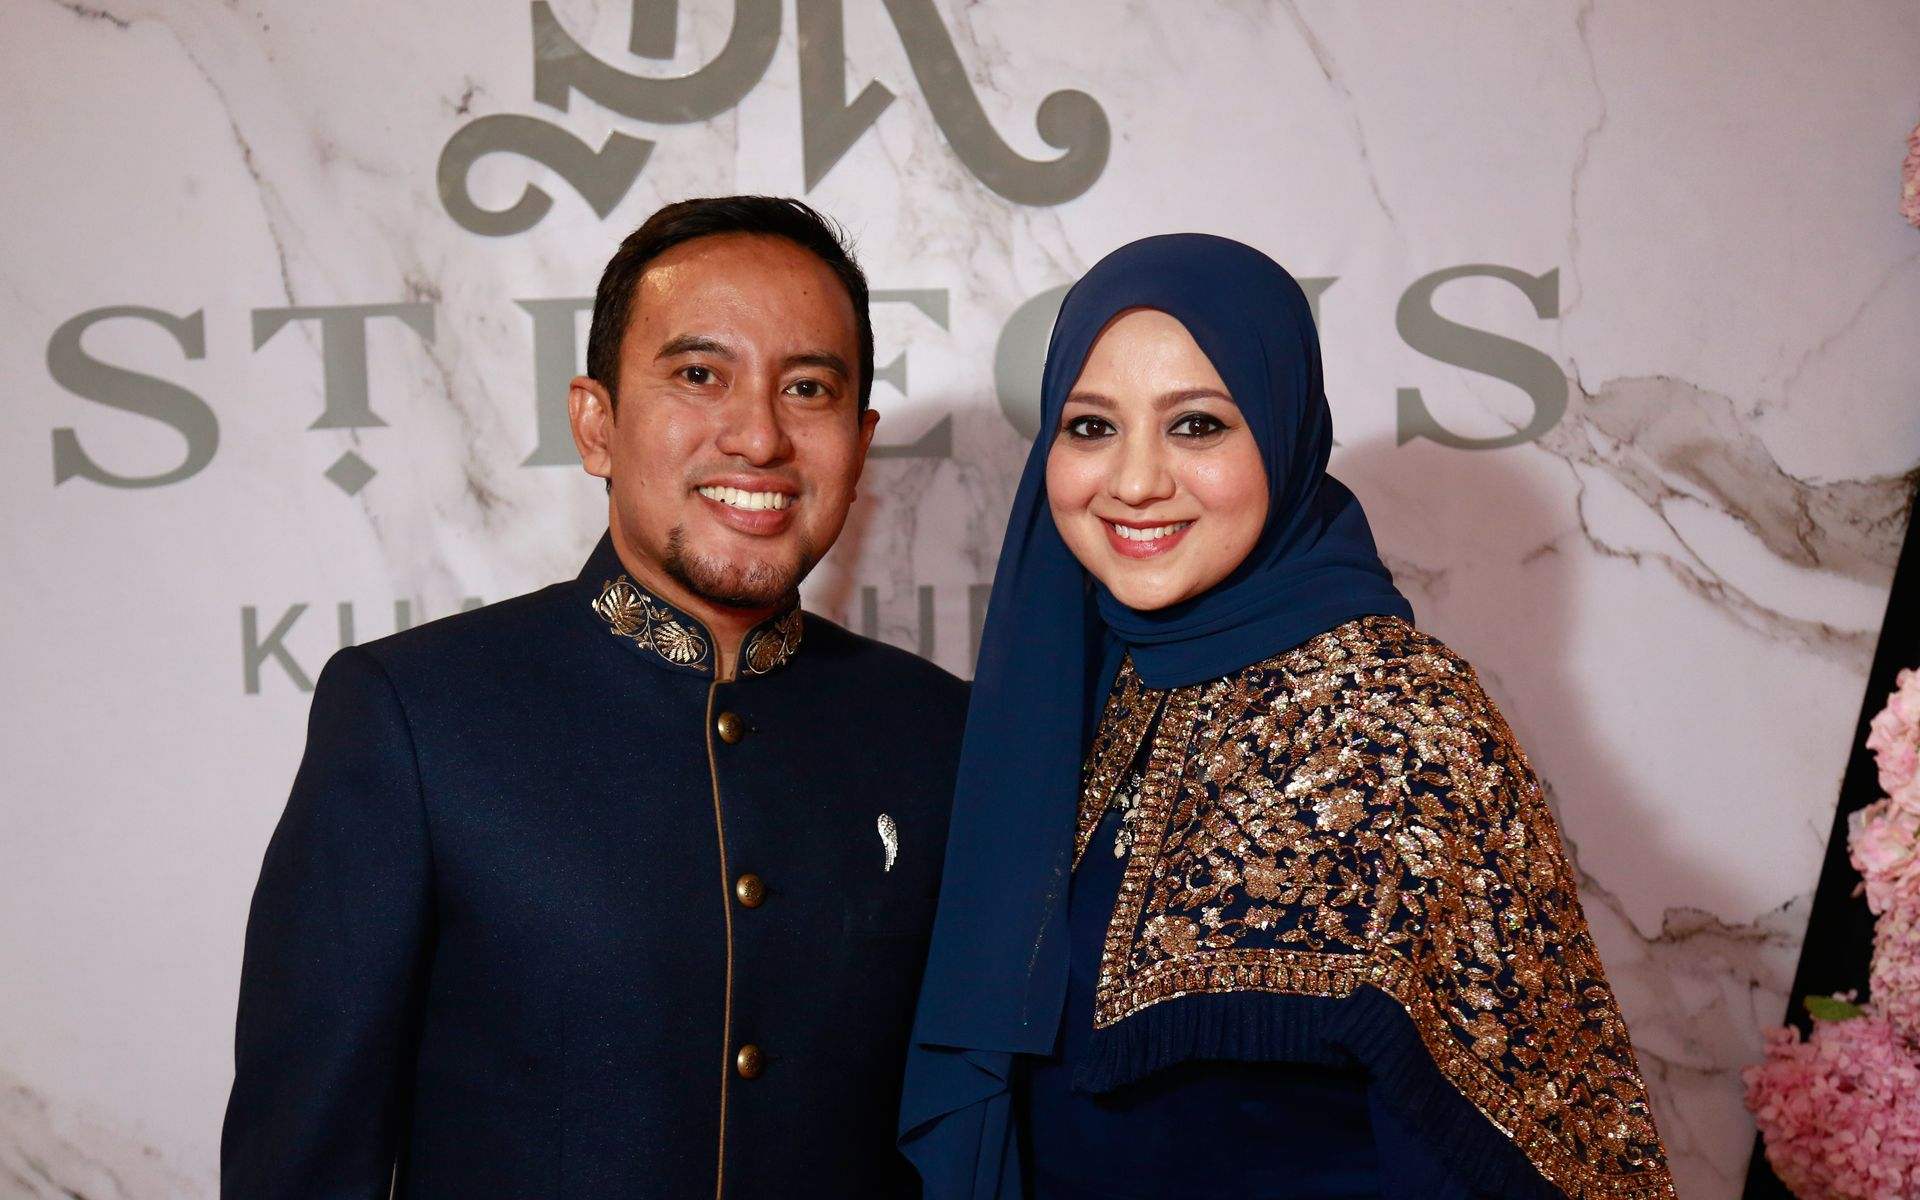 Faiz Sabri and Rozana Mumtaz